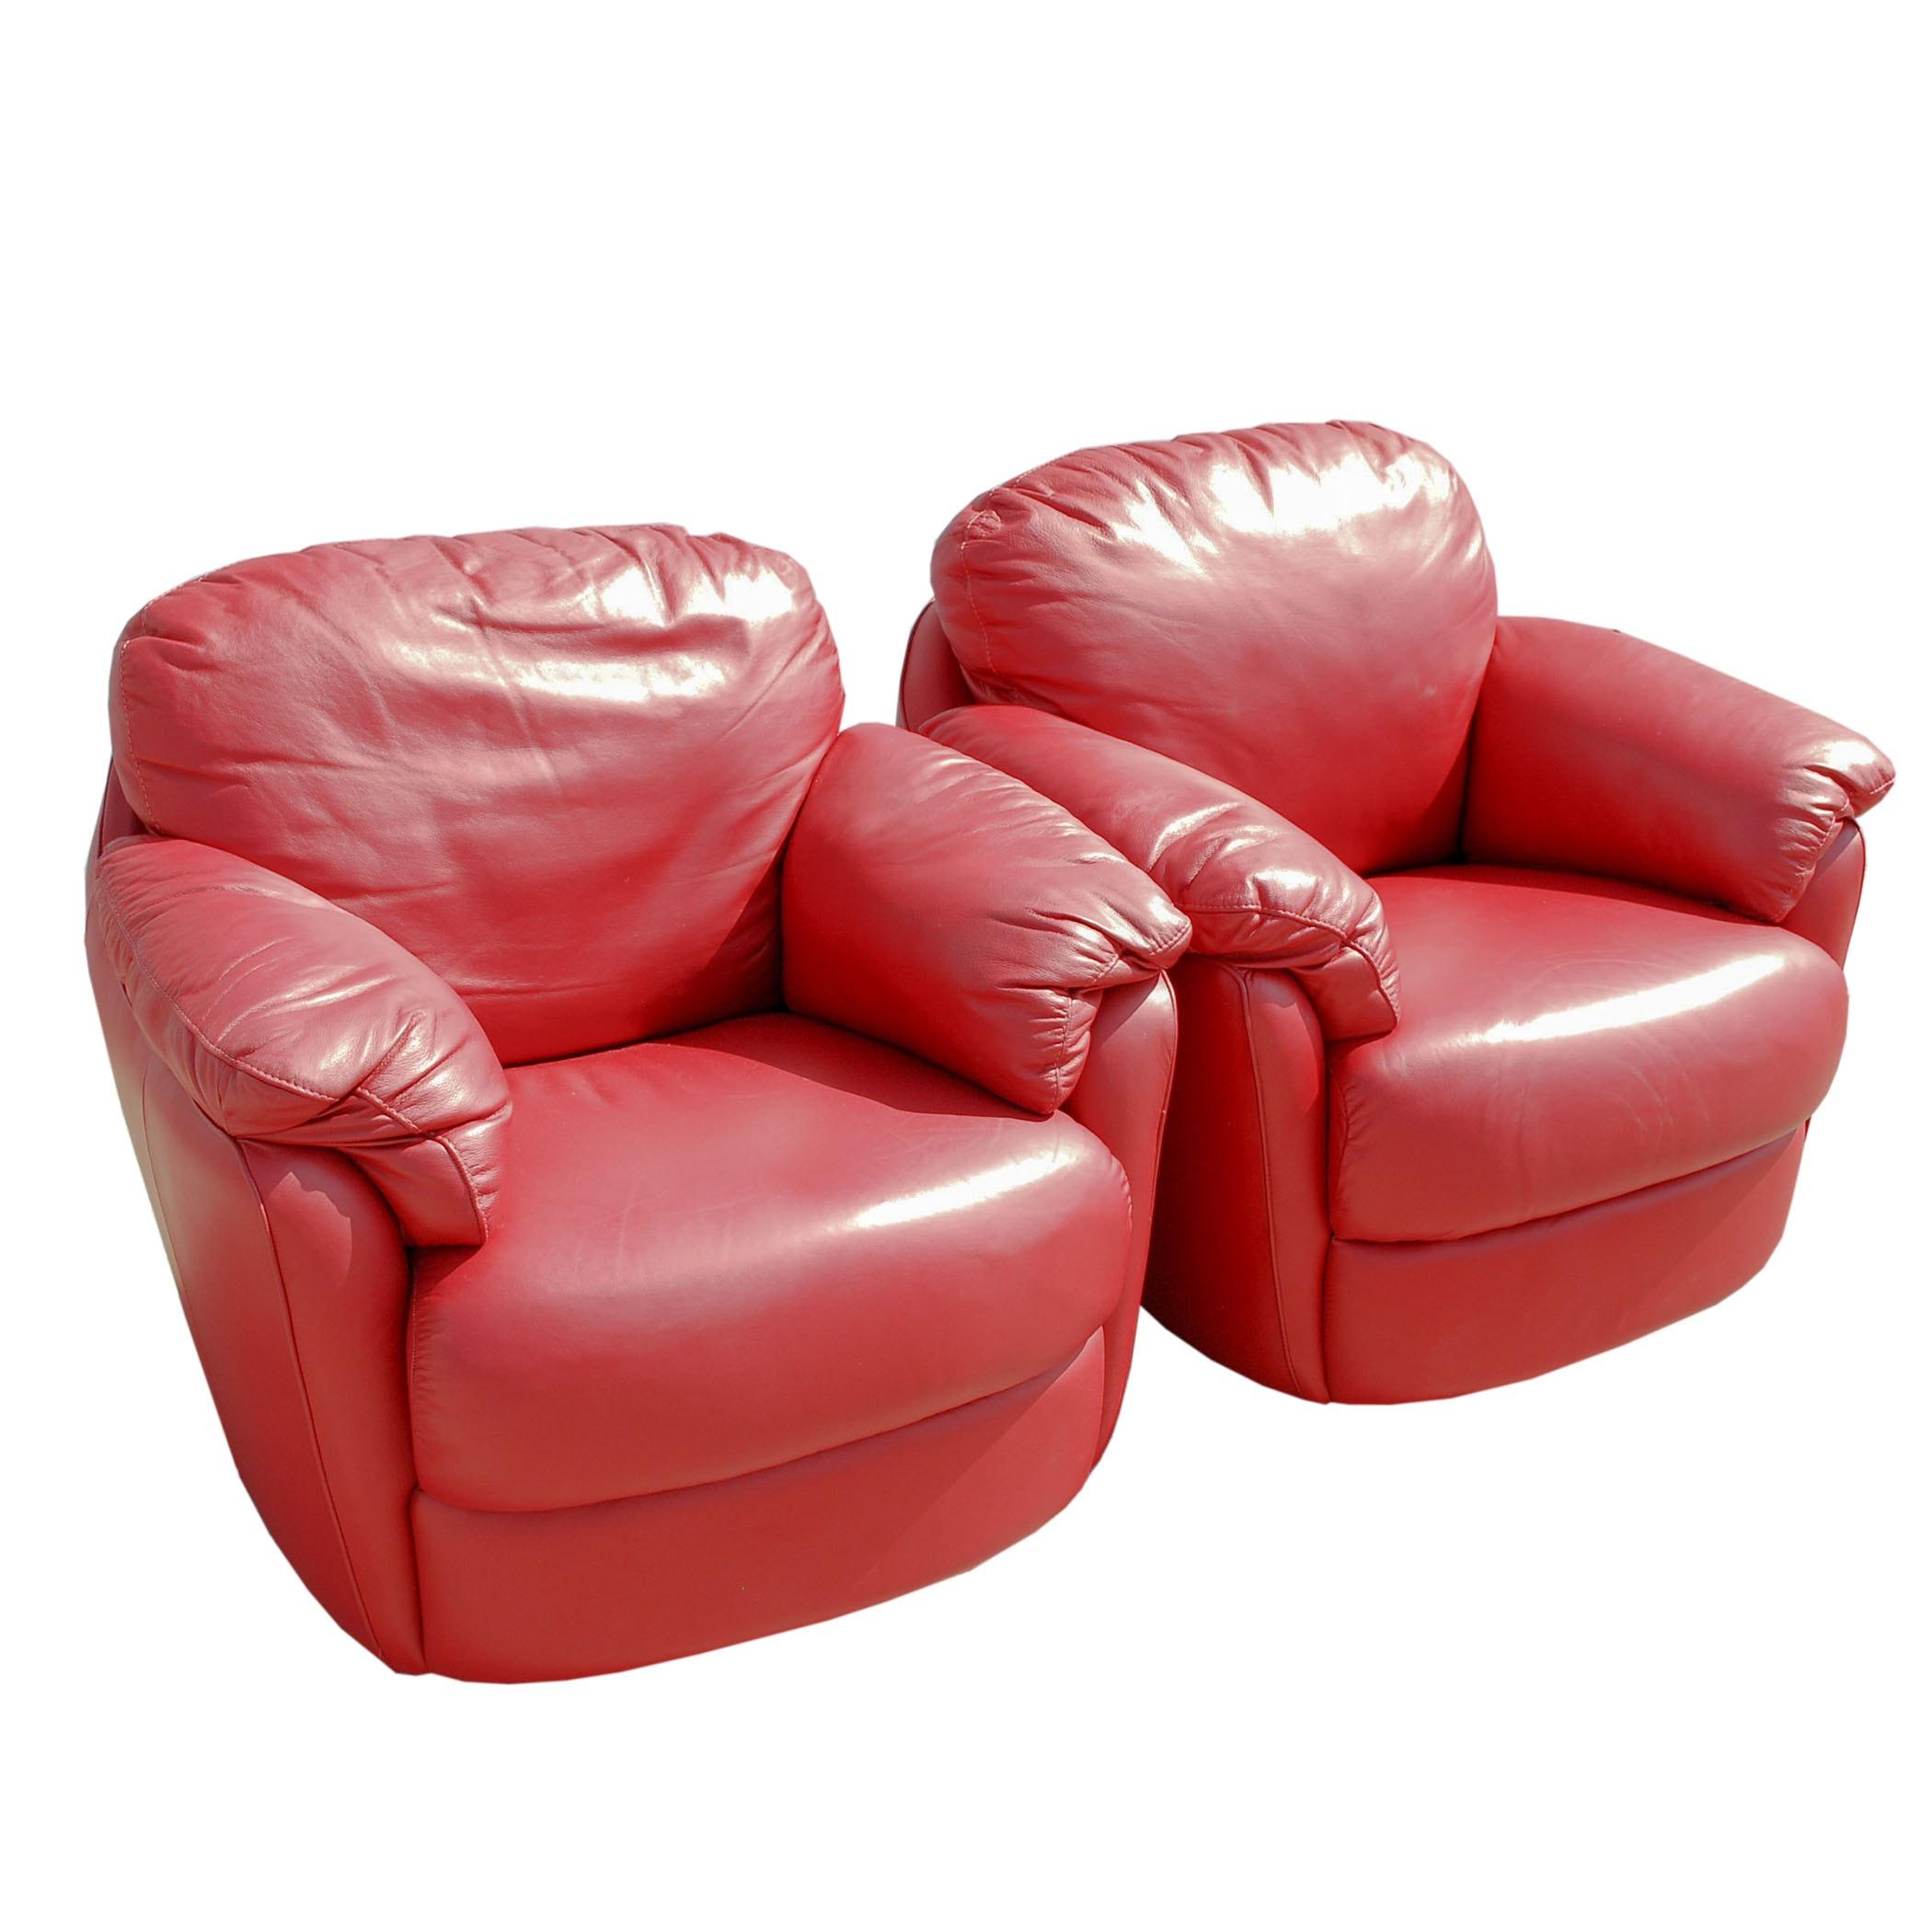 Pair of Natuzzi Red Leather Swivel Rockers